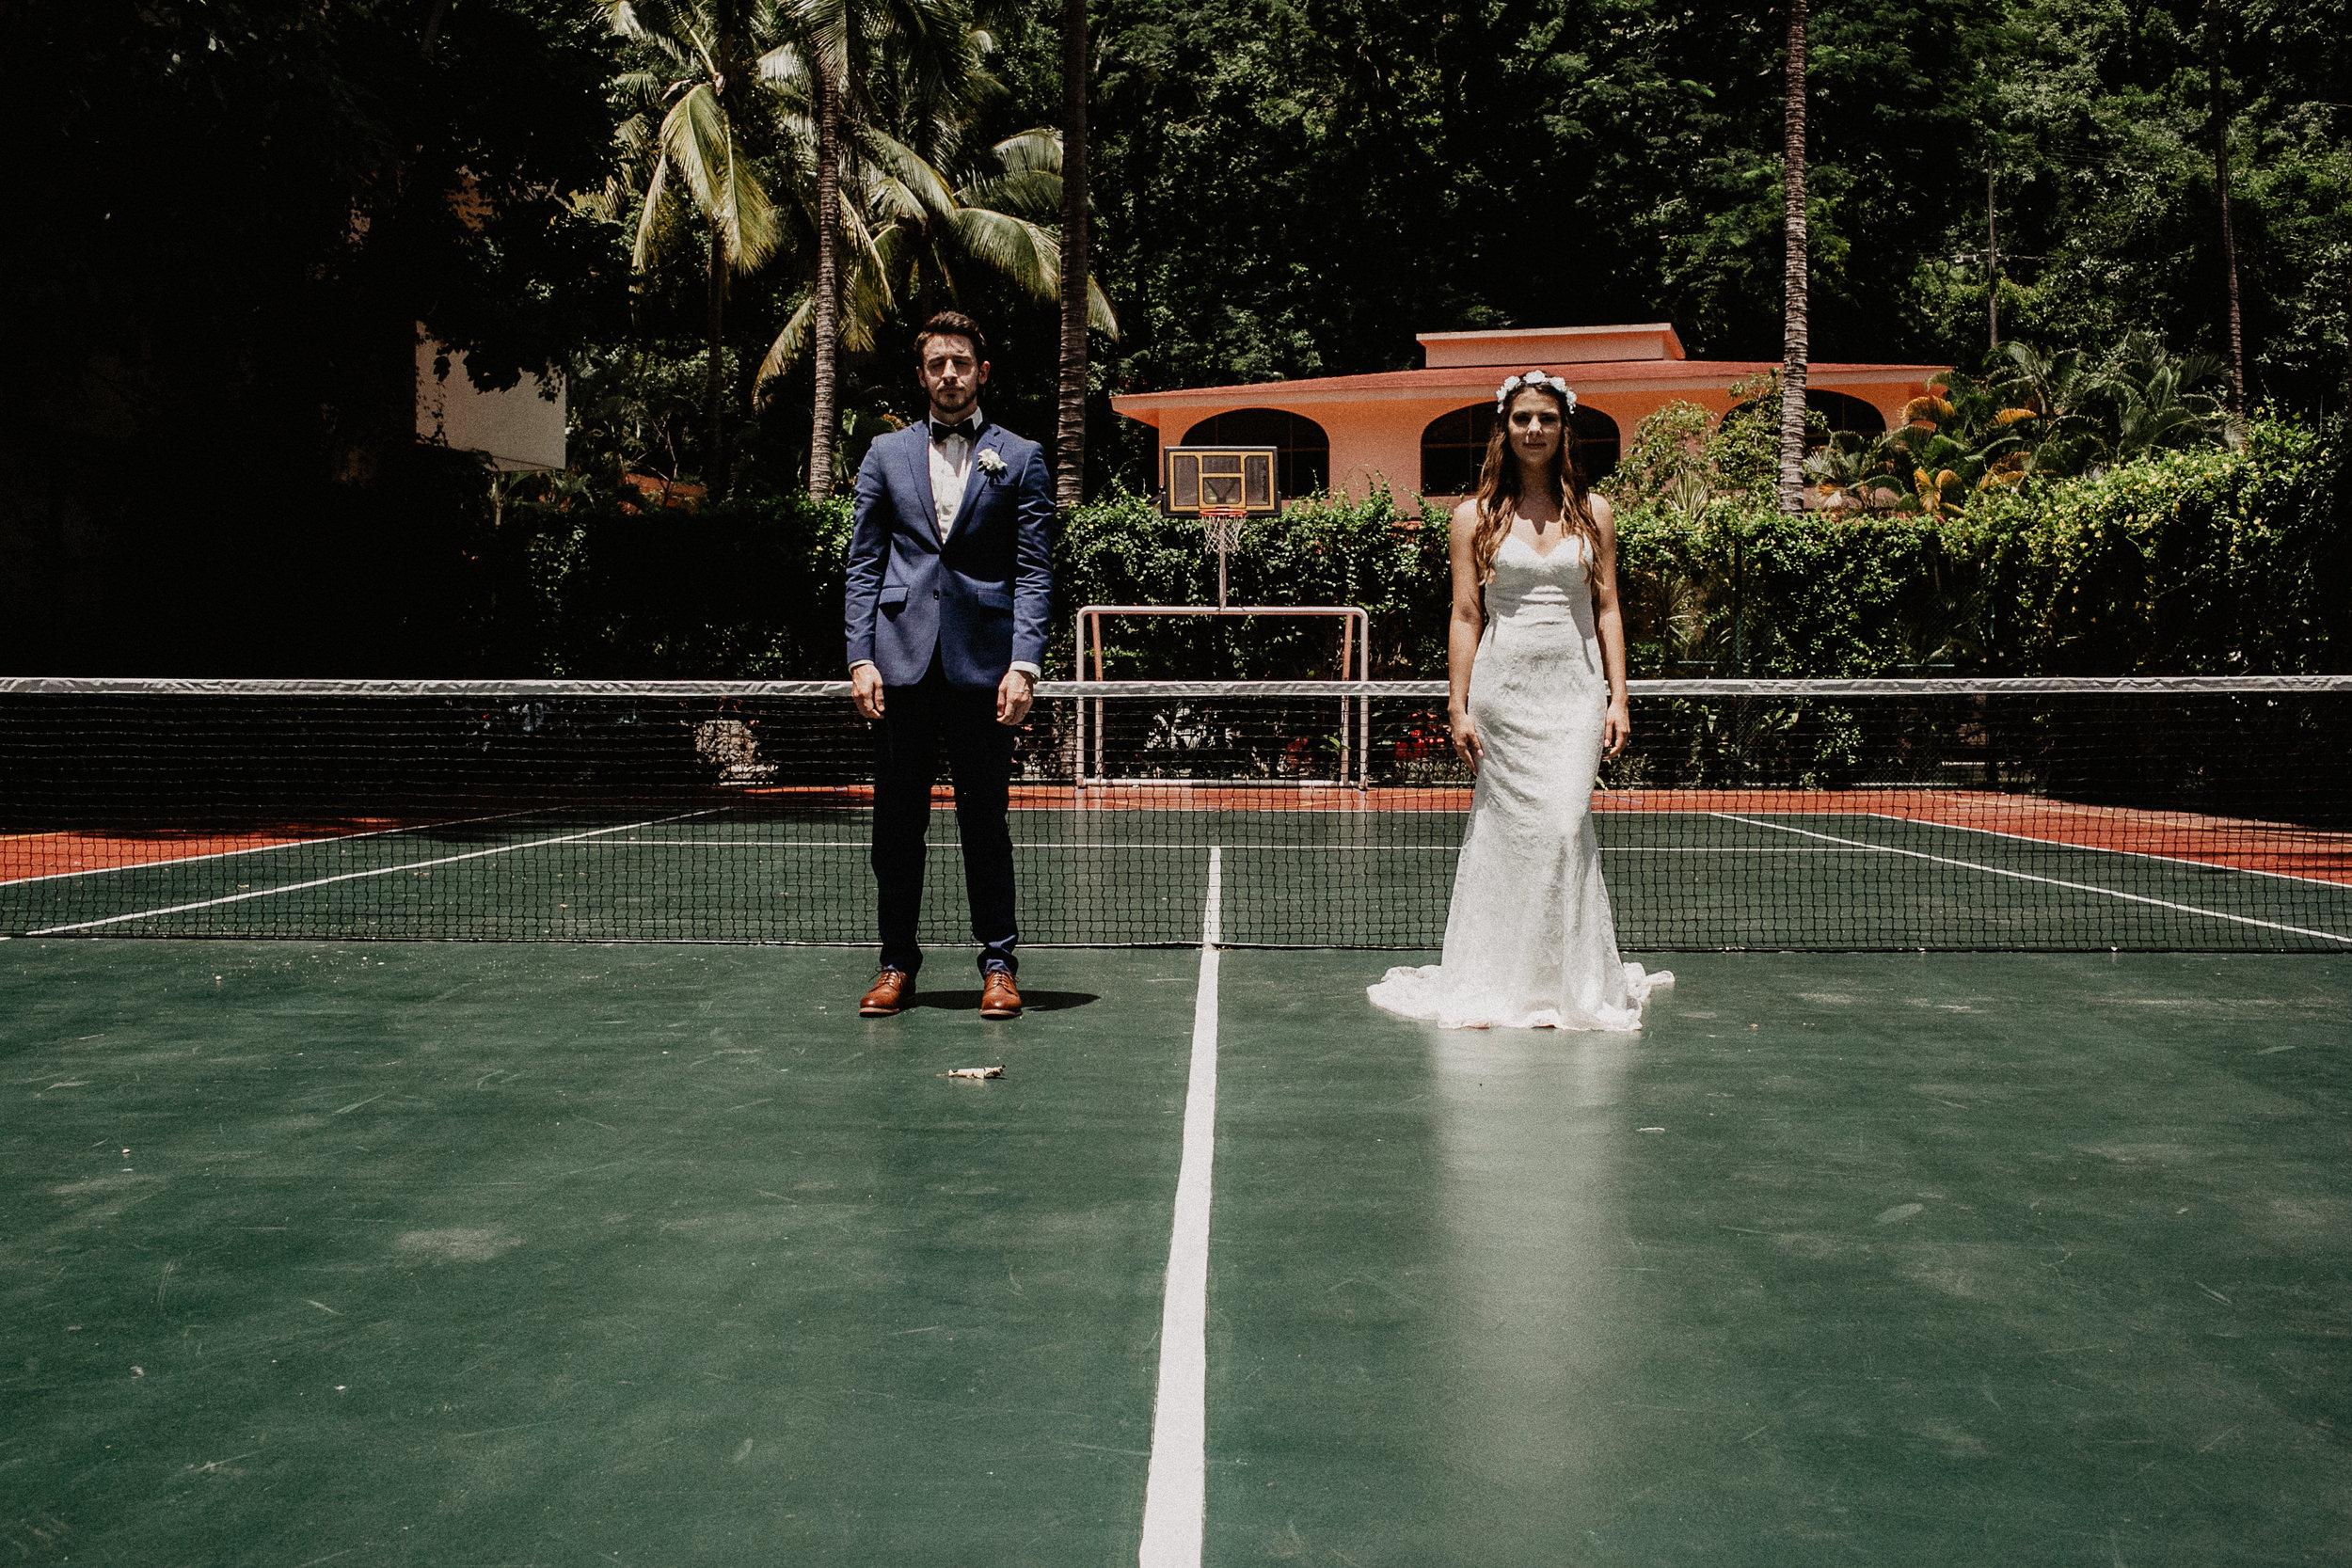 alfonso_flores_destination_wedding_photography_puerto_vallarta_hotel_barcelo_vallarta_cuttler_amela-313.JPG